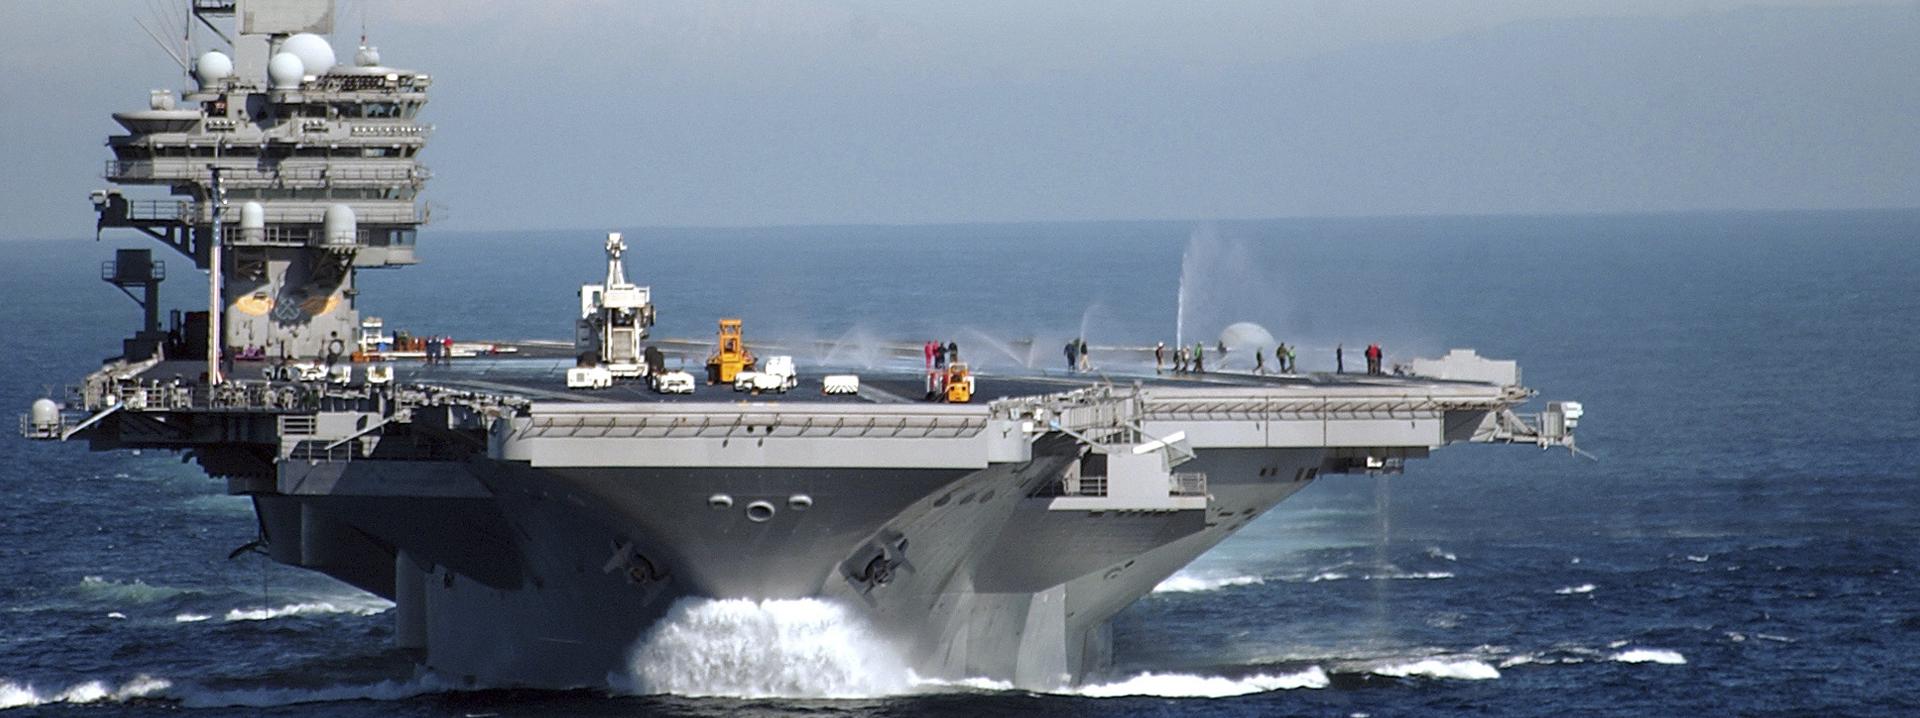 image of submarine close up